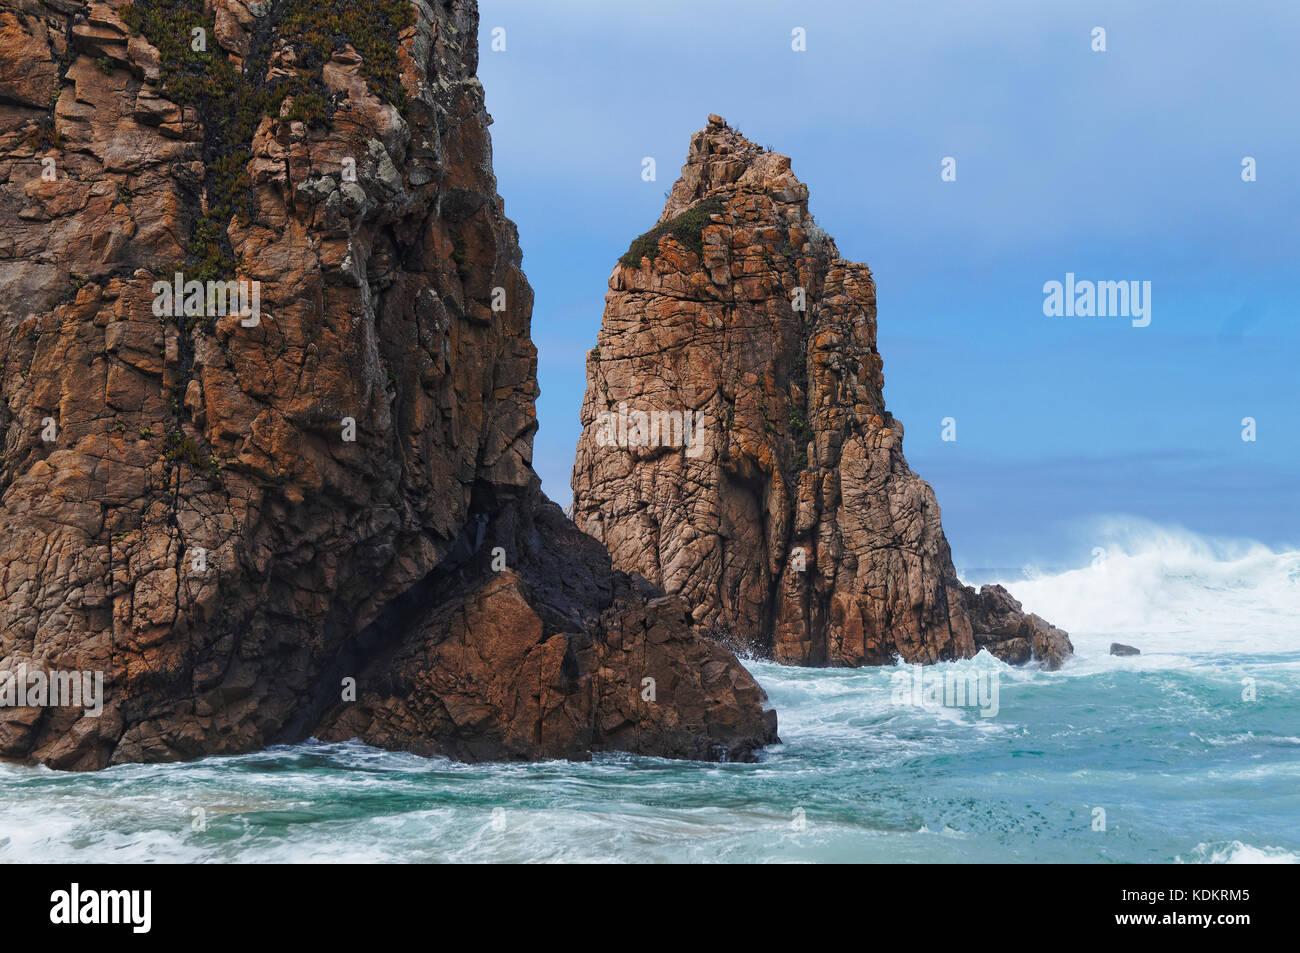 Massive rocks and the raging ocean Stock Photo